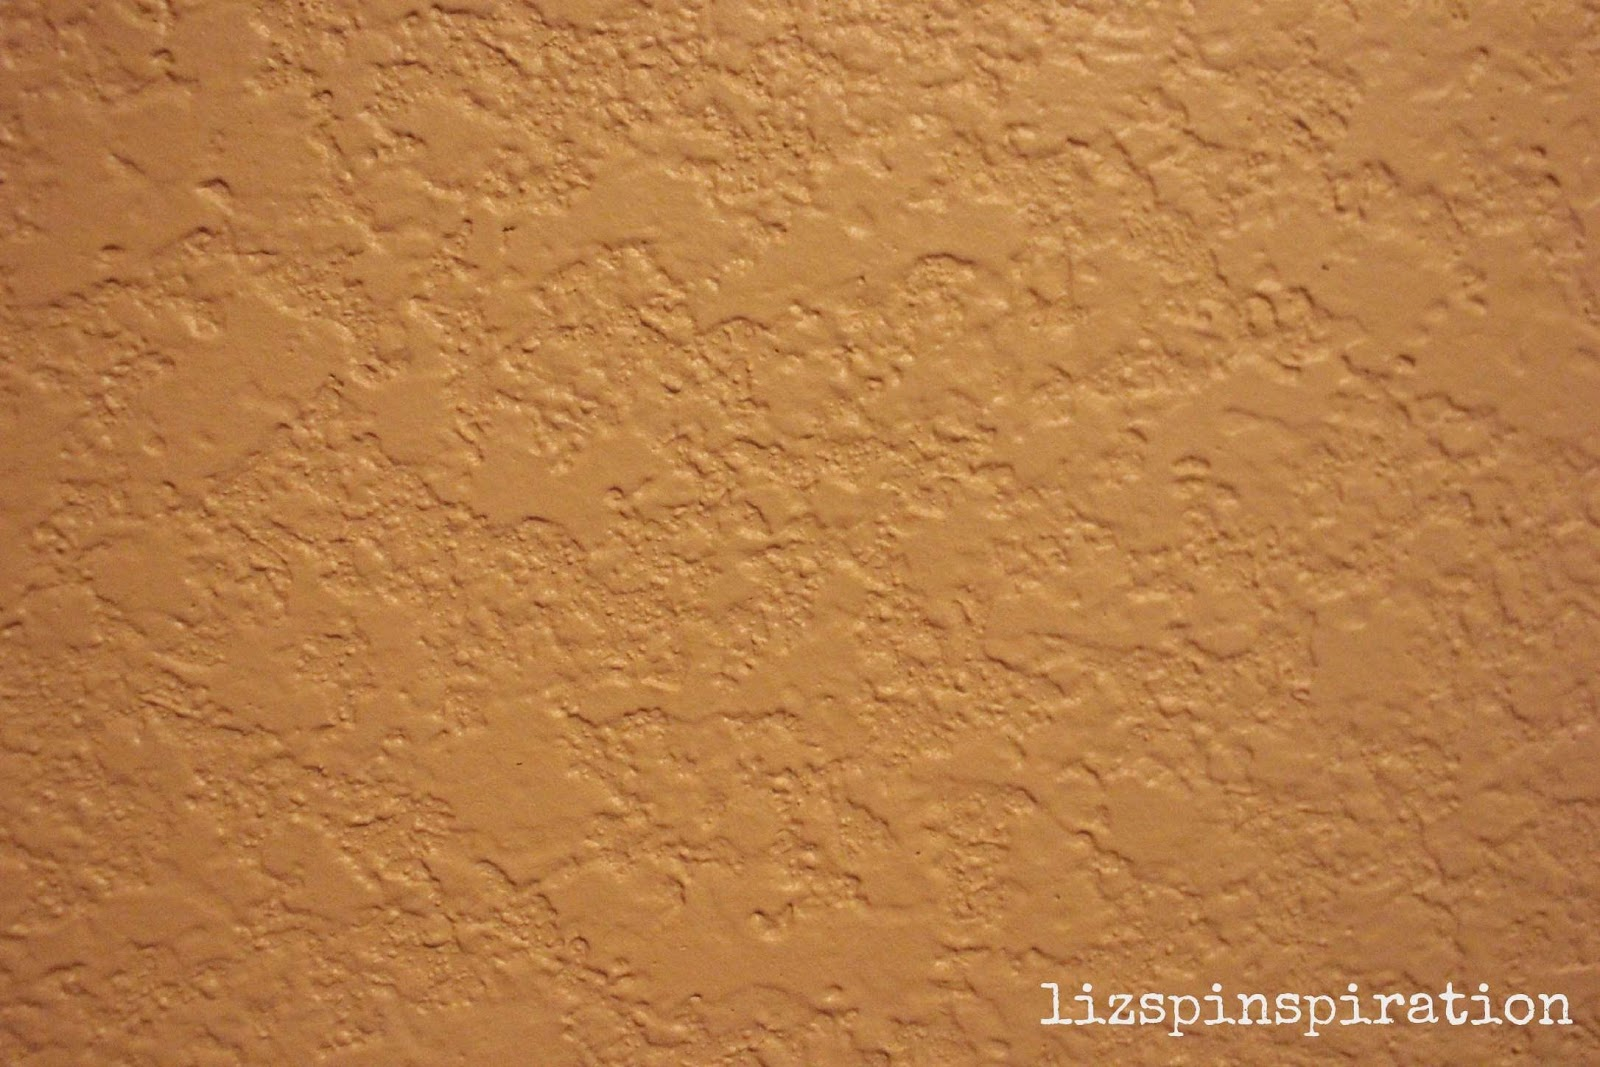 Pinspiration - How to make vinyl decals stick to textured walls